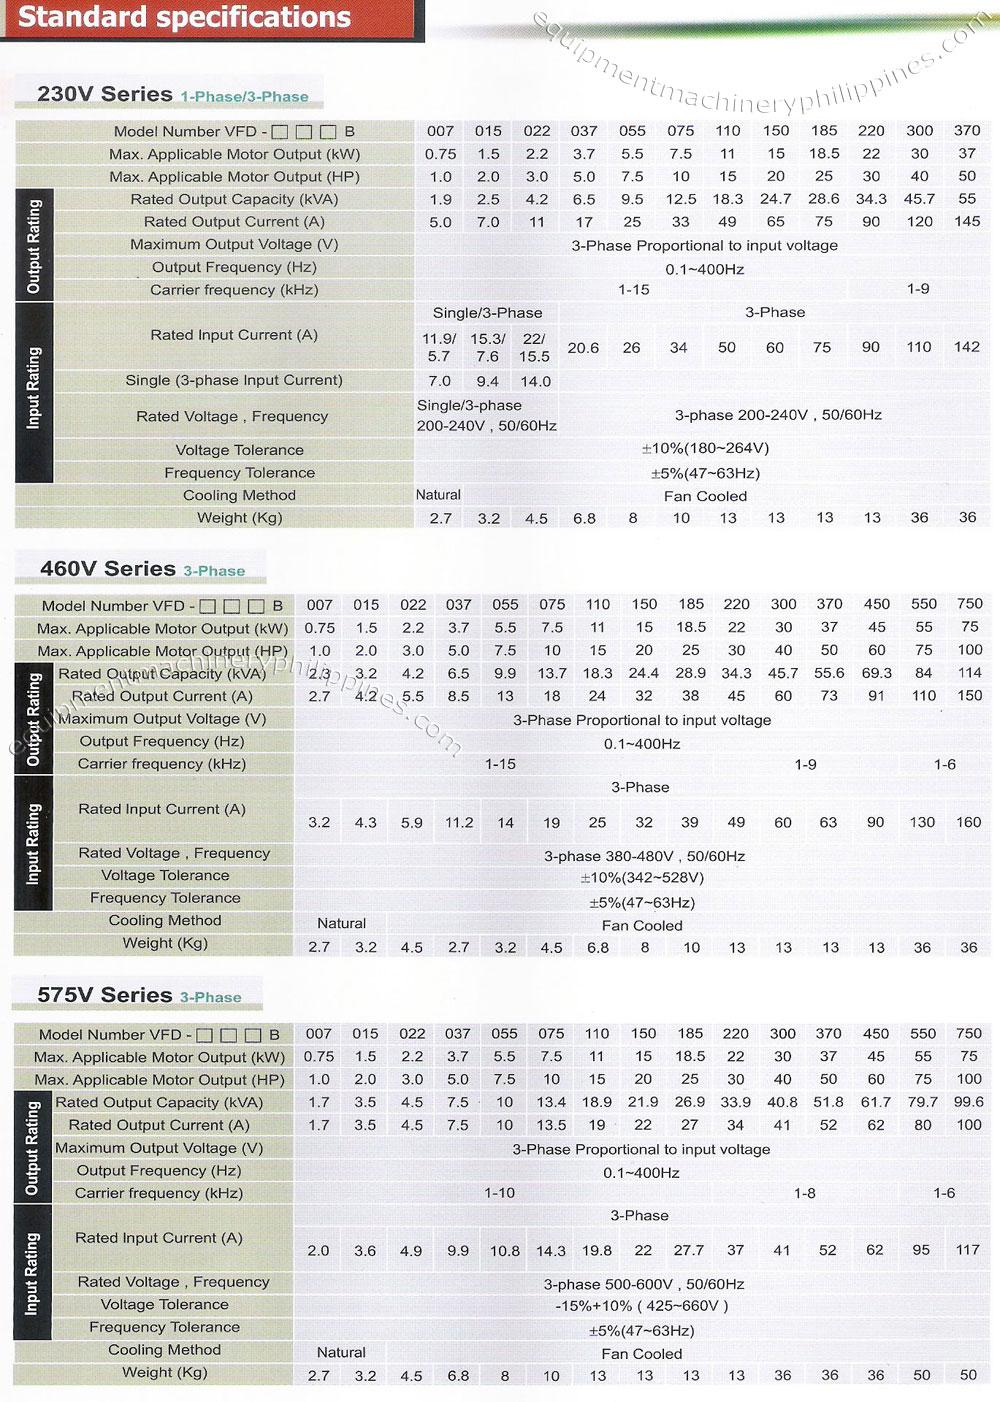 Delta Vfd B Series Standard Specifications Philippines